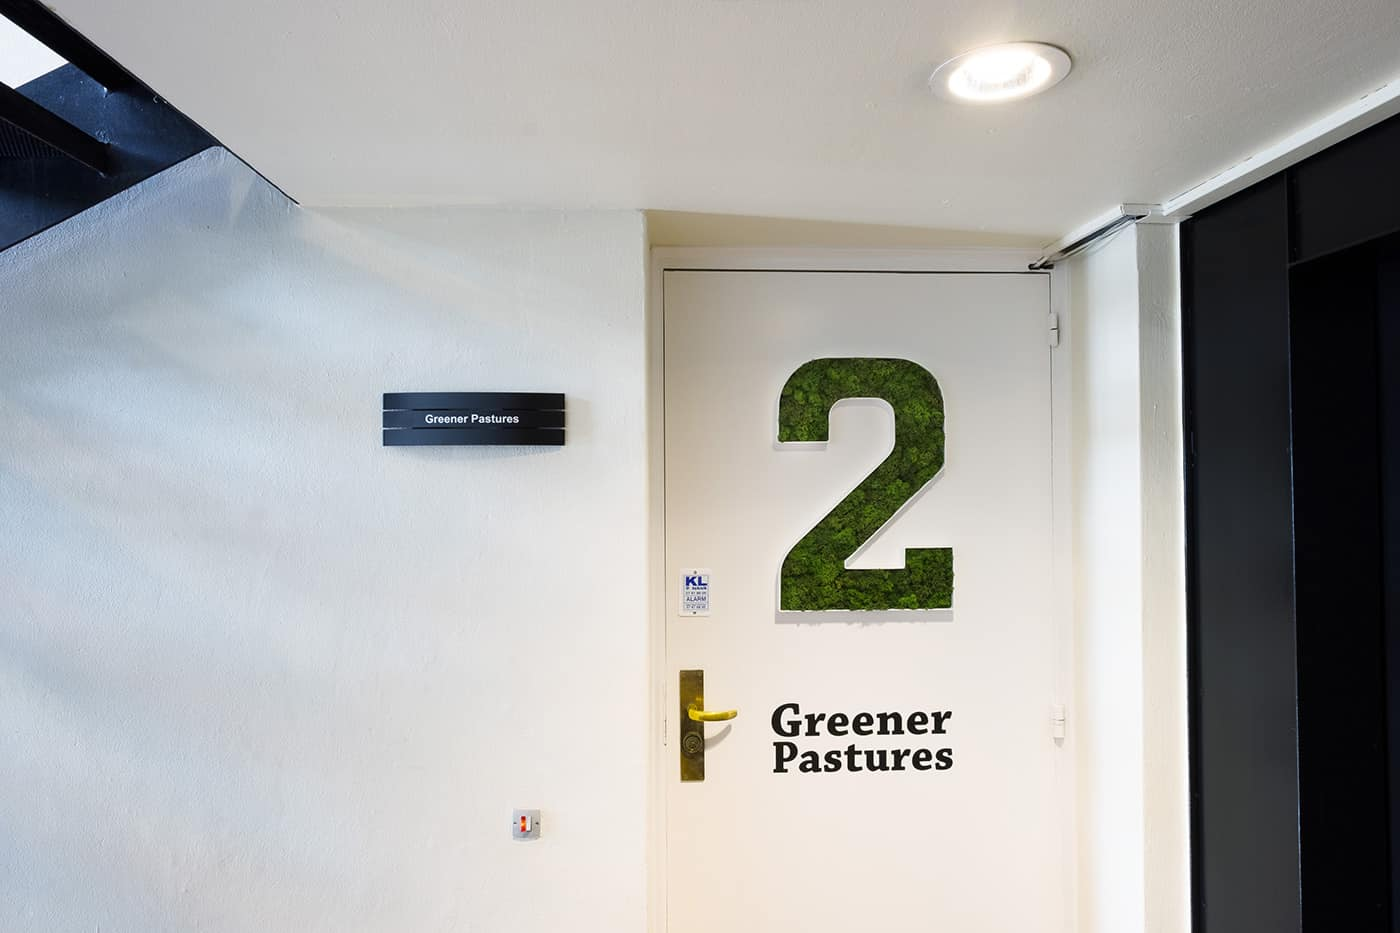 RITAarch, Greener Pastures, indretning, mødelokaler, grafik, detalje, grafikmos